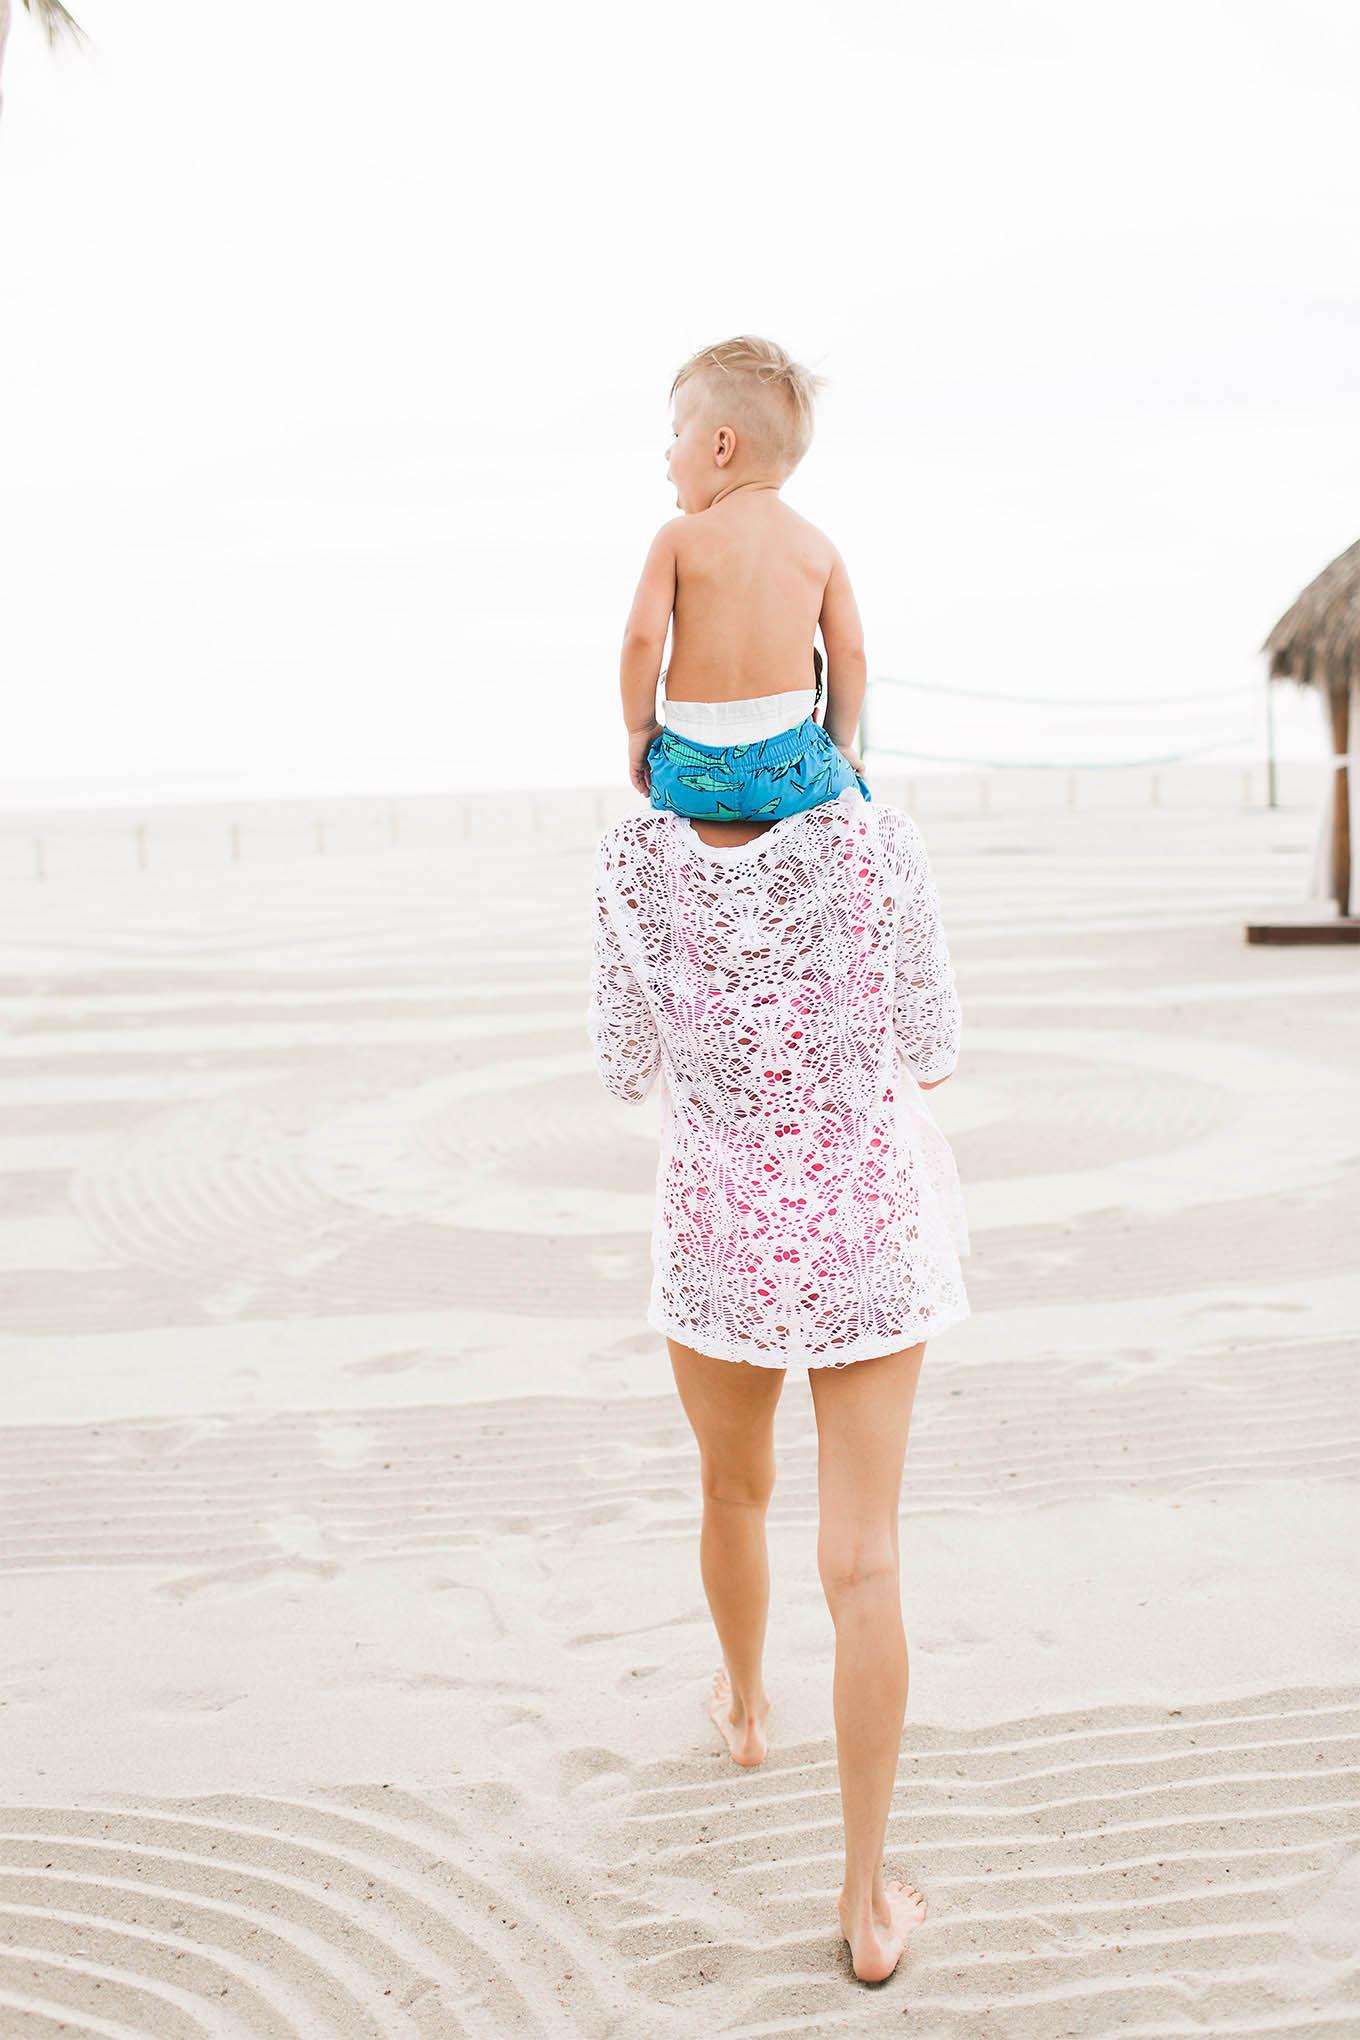 Family beach attire under $30